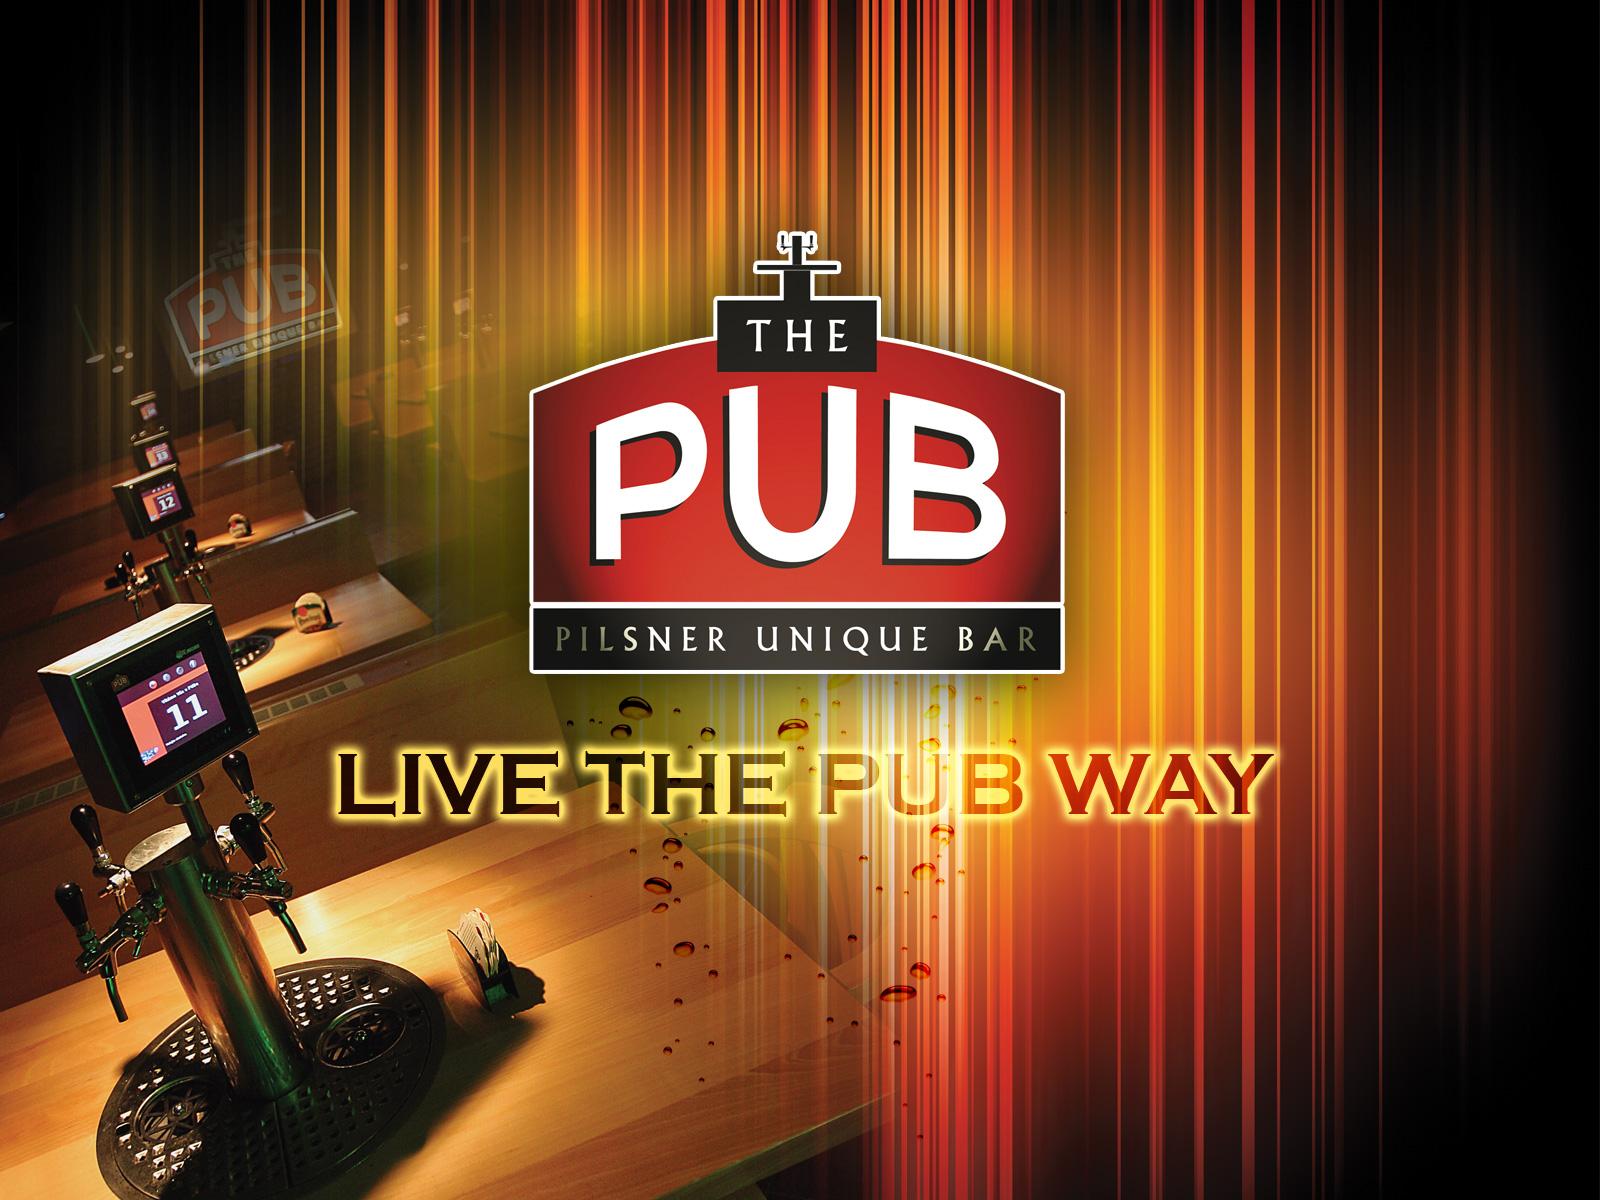 Downloads Pilsner Unique Bar